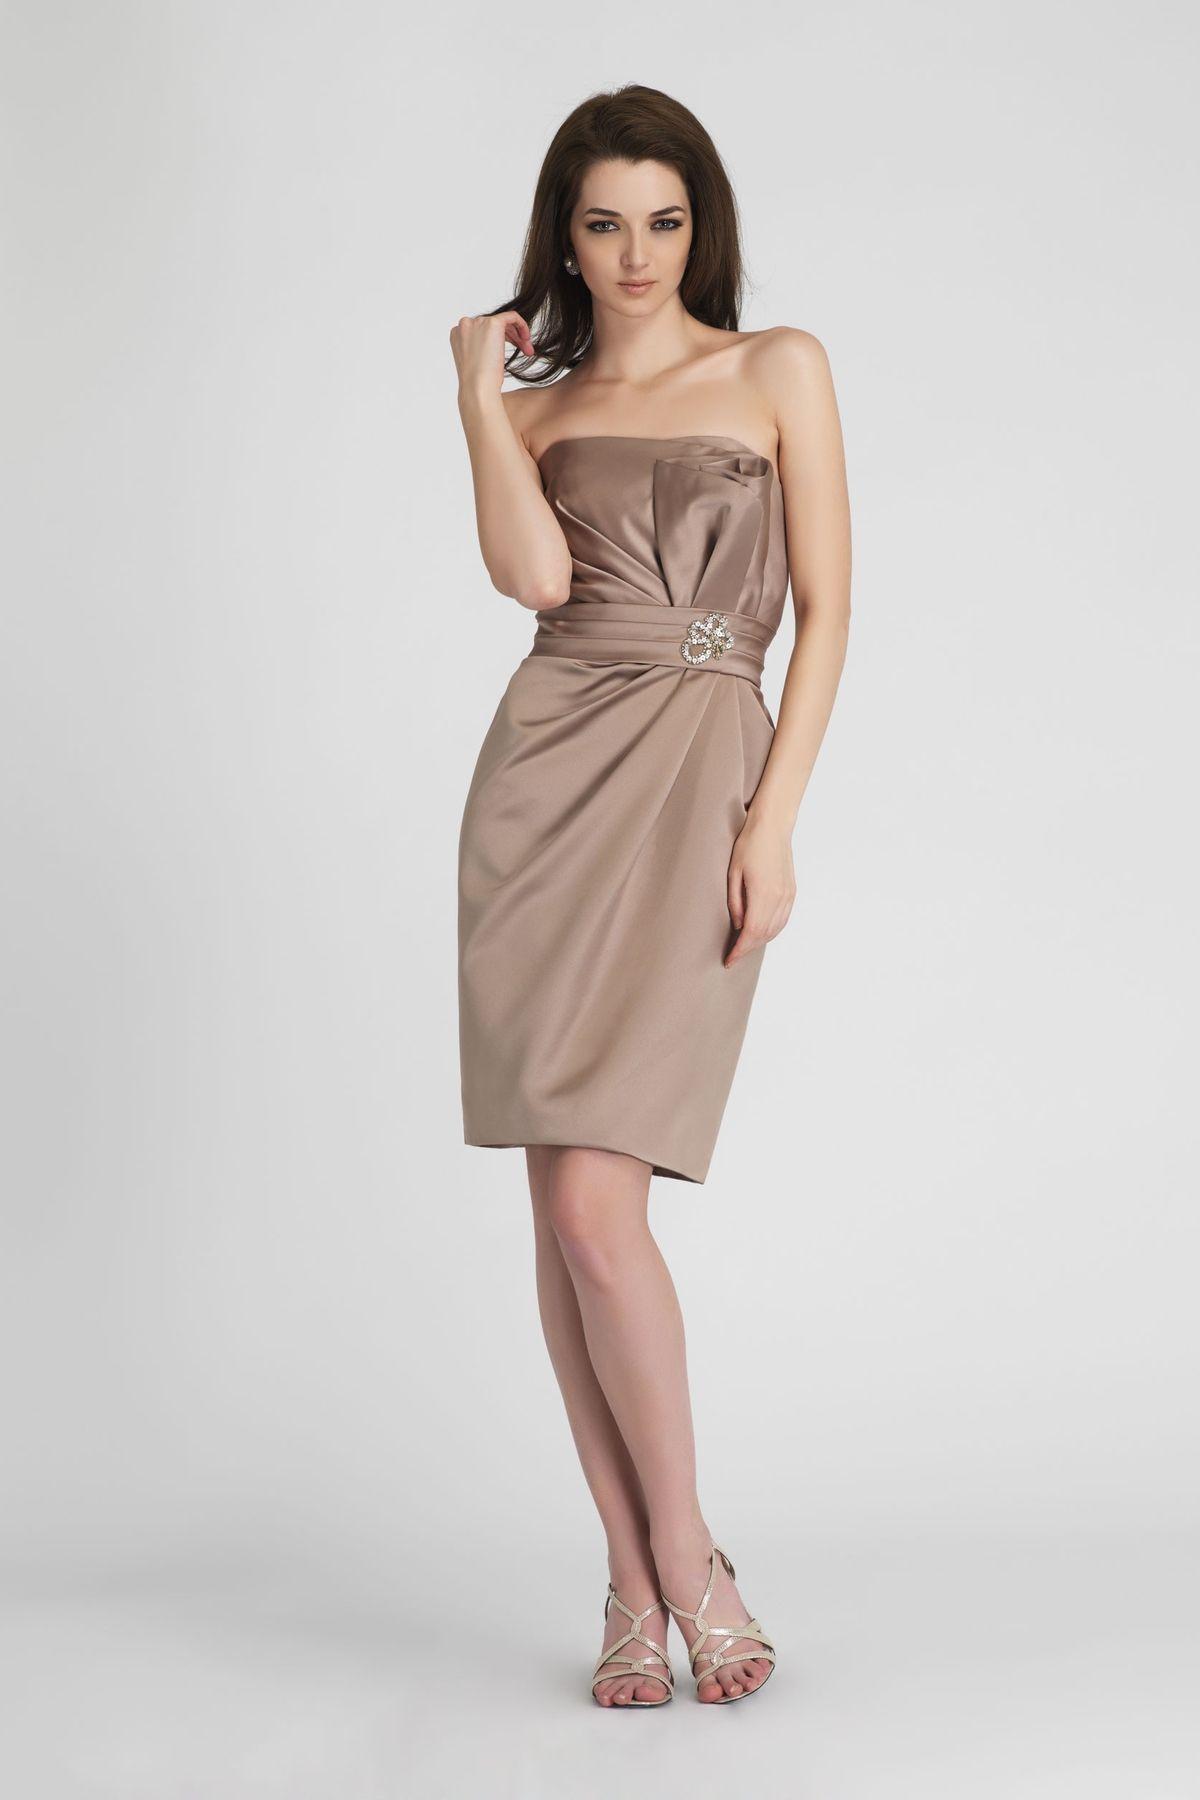 acfc9d87e9c Alexia Designs Junior Bridesmaid Dresses - Data Dynamic AG